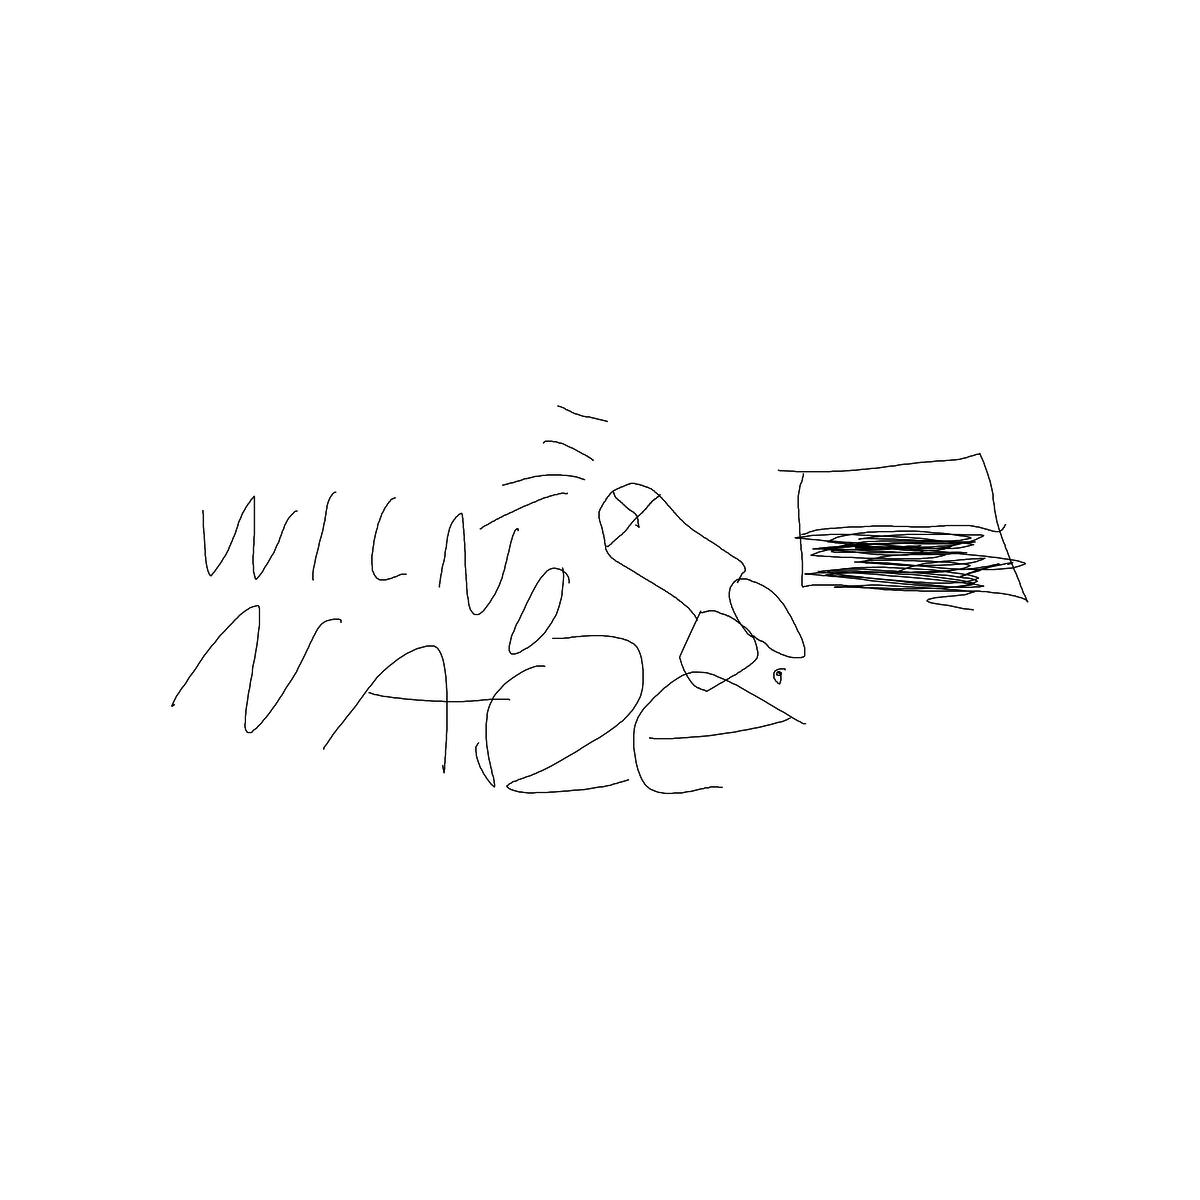 BAAAM drawing#14616 lat:54.6778602600097660lng: 25.2793159484863280